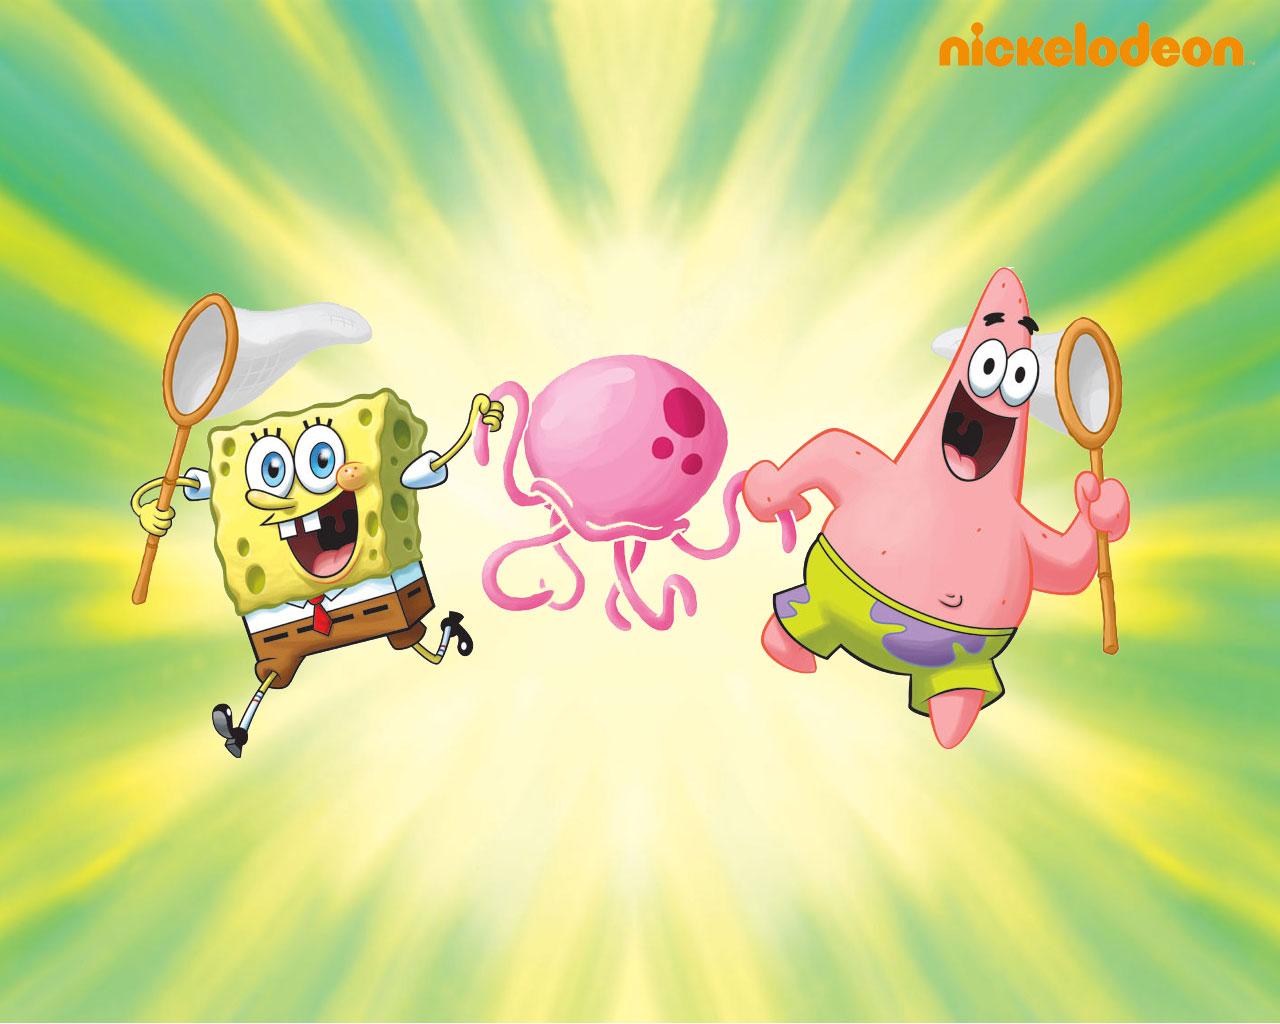 Spongebob squarepants spongebob patrick